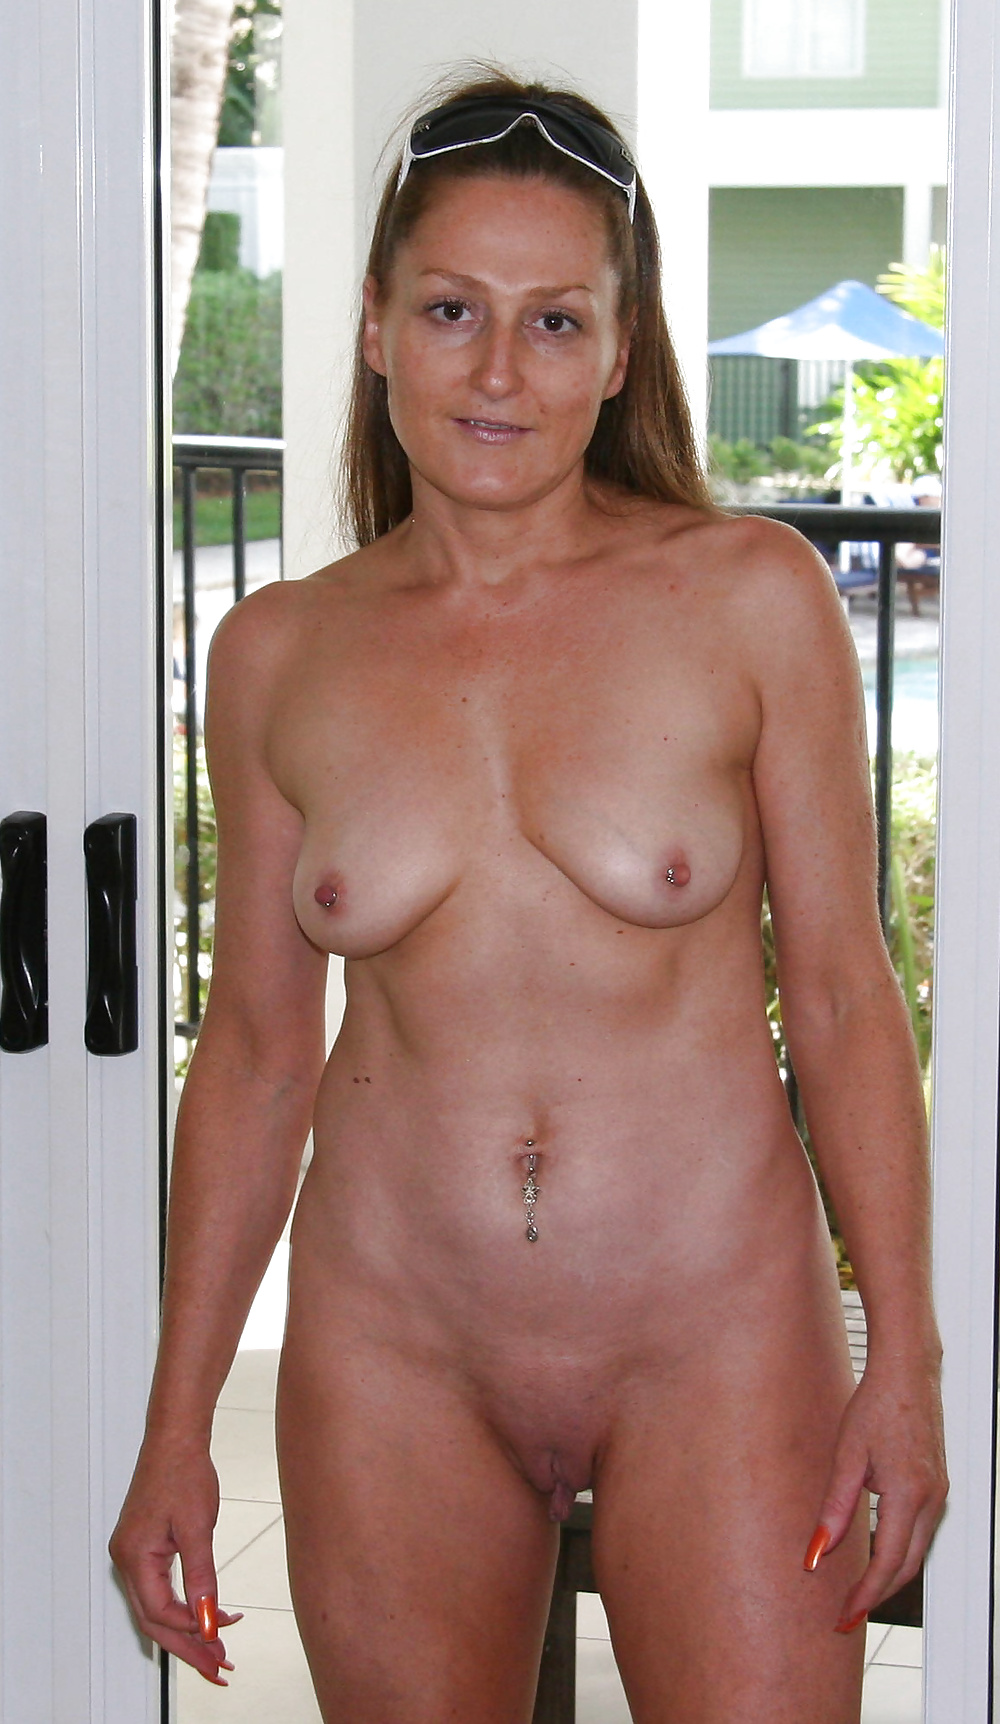 mature-nude-frontal-free-hardcore-amatuer-sex